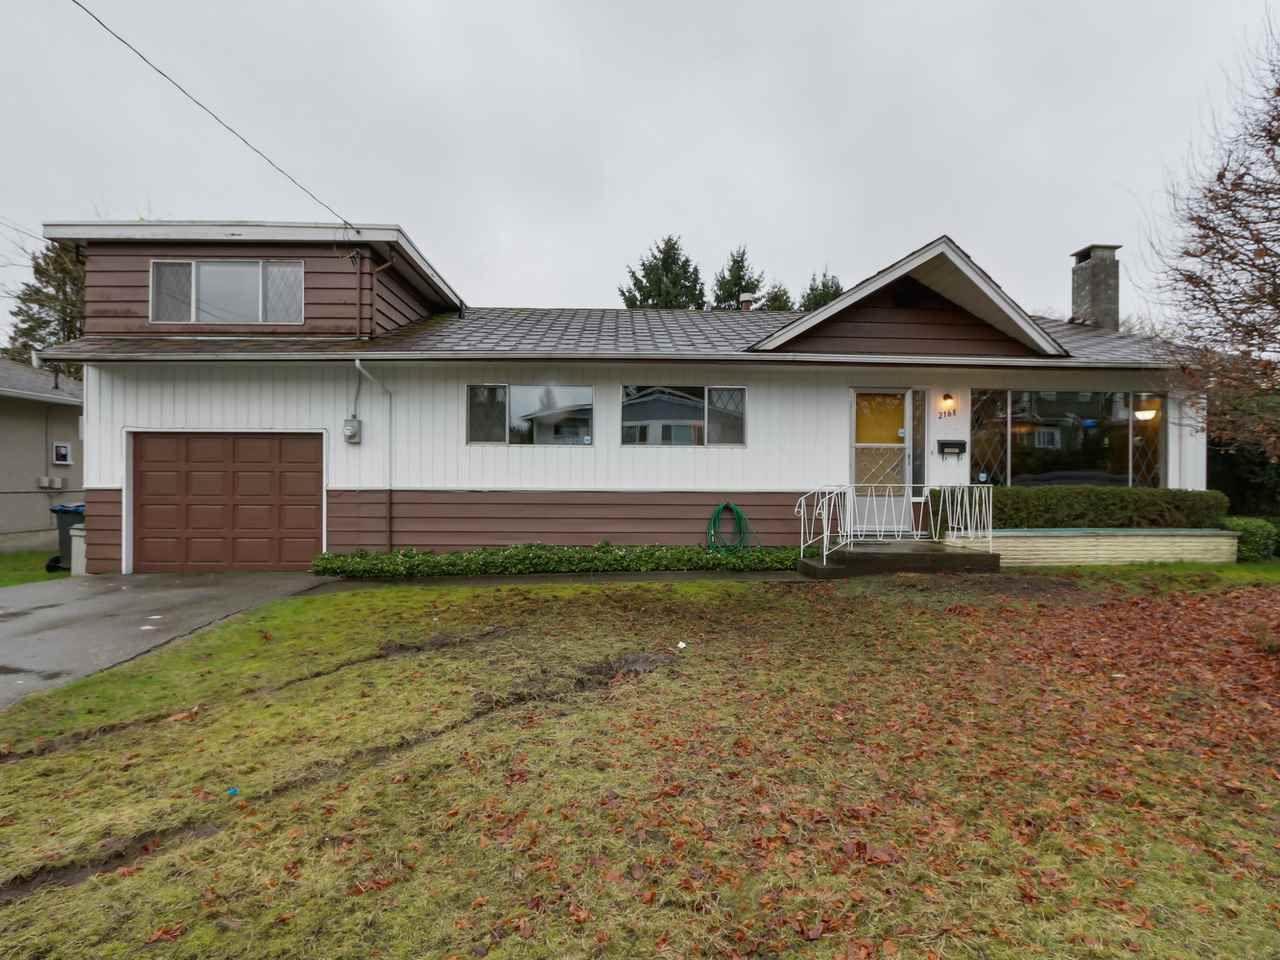 Main Photo: 2168 PRAIRIE Avenue in Port Coquitlam: Glenwood PQ House for sale : MLS®# R2041317